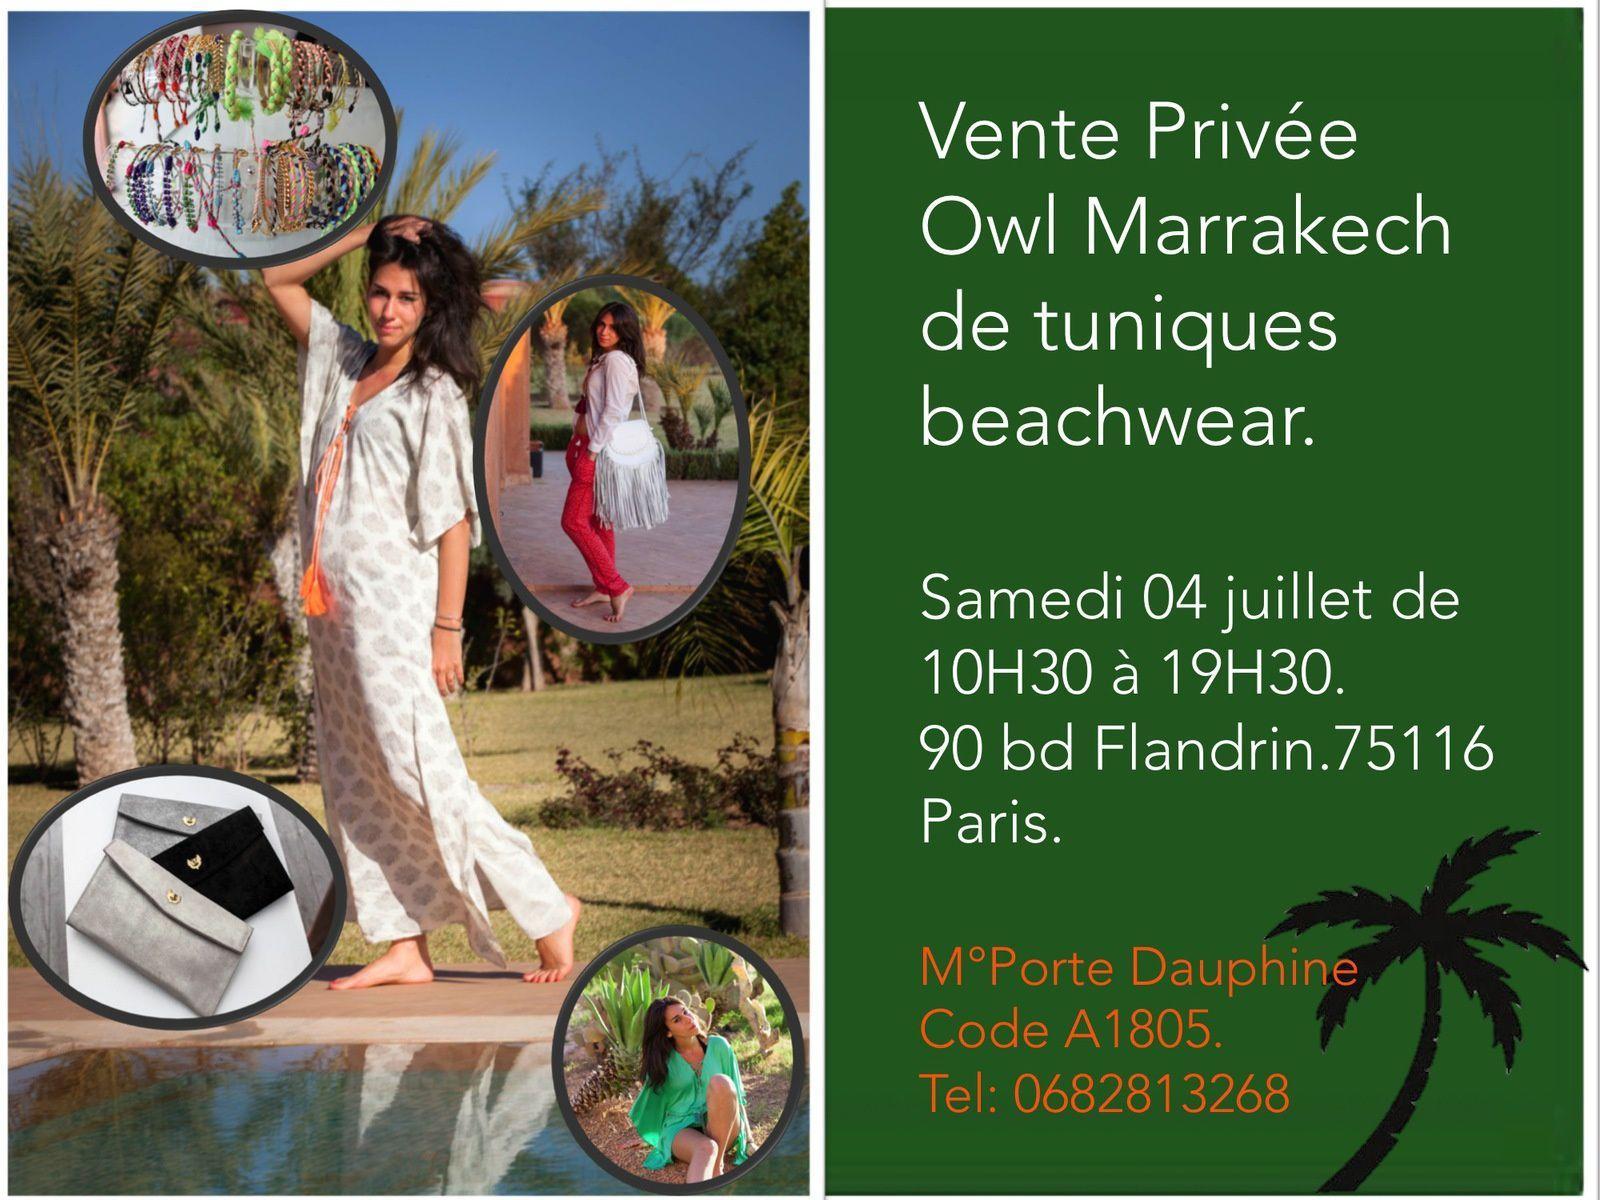 White boho-chic dress by Owl Marrakech